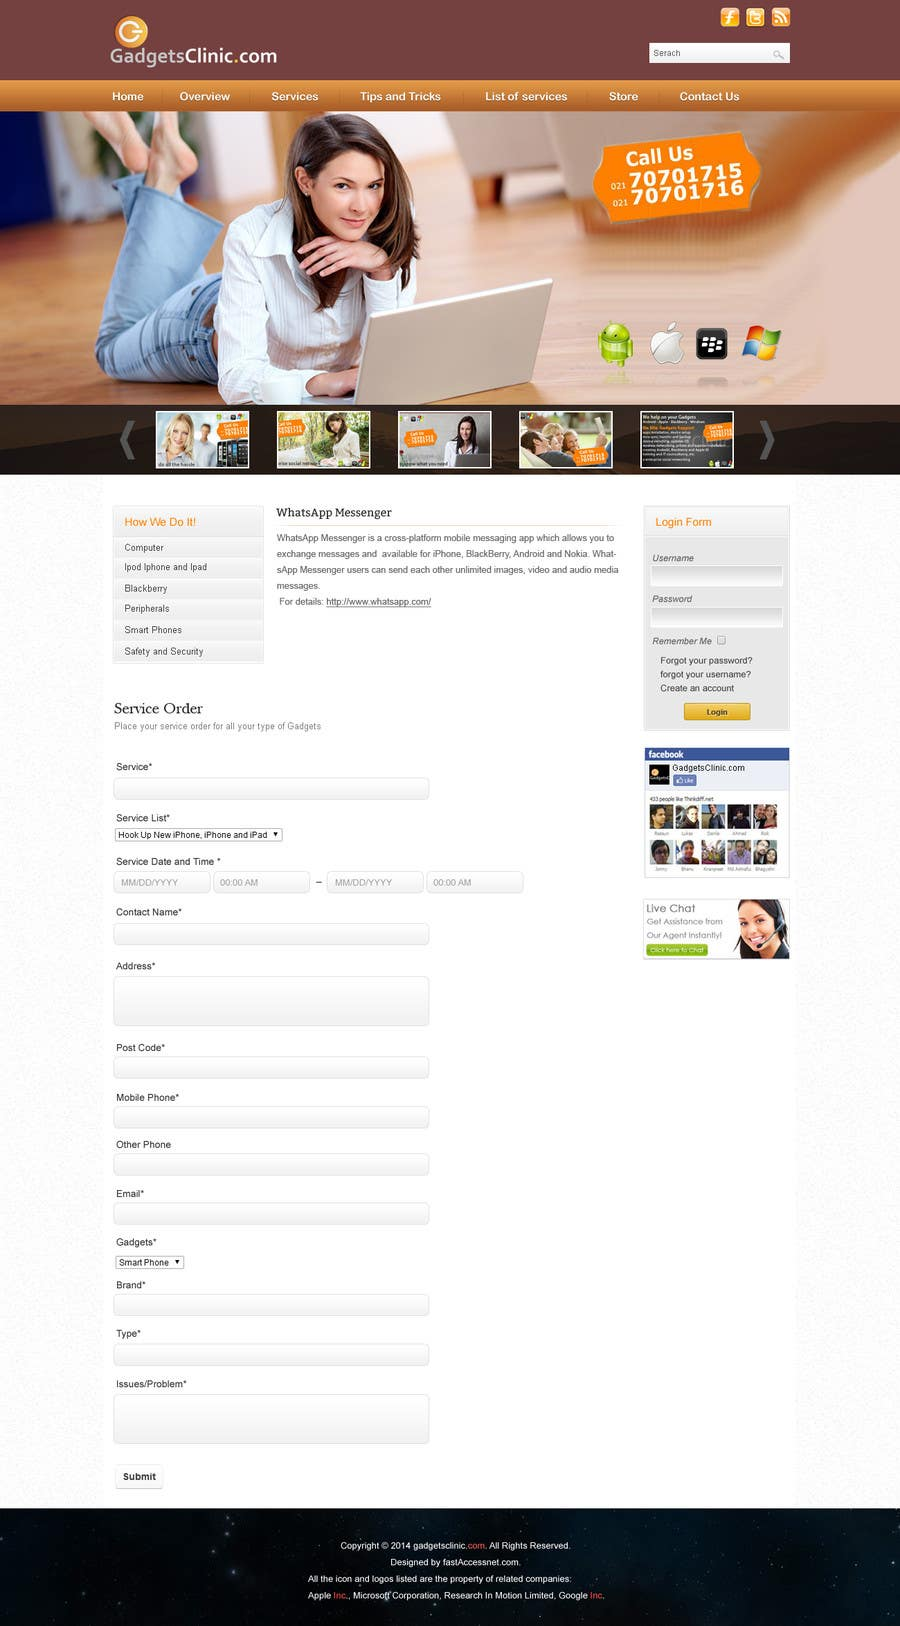 Penyertaan Peraduan #                                        6                                      untuk                                         redesign website www.GadgetsClinic.com